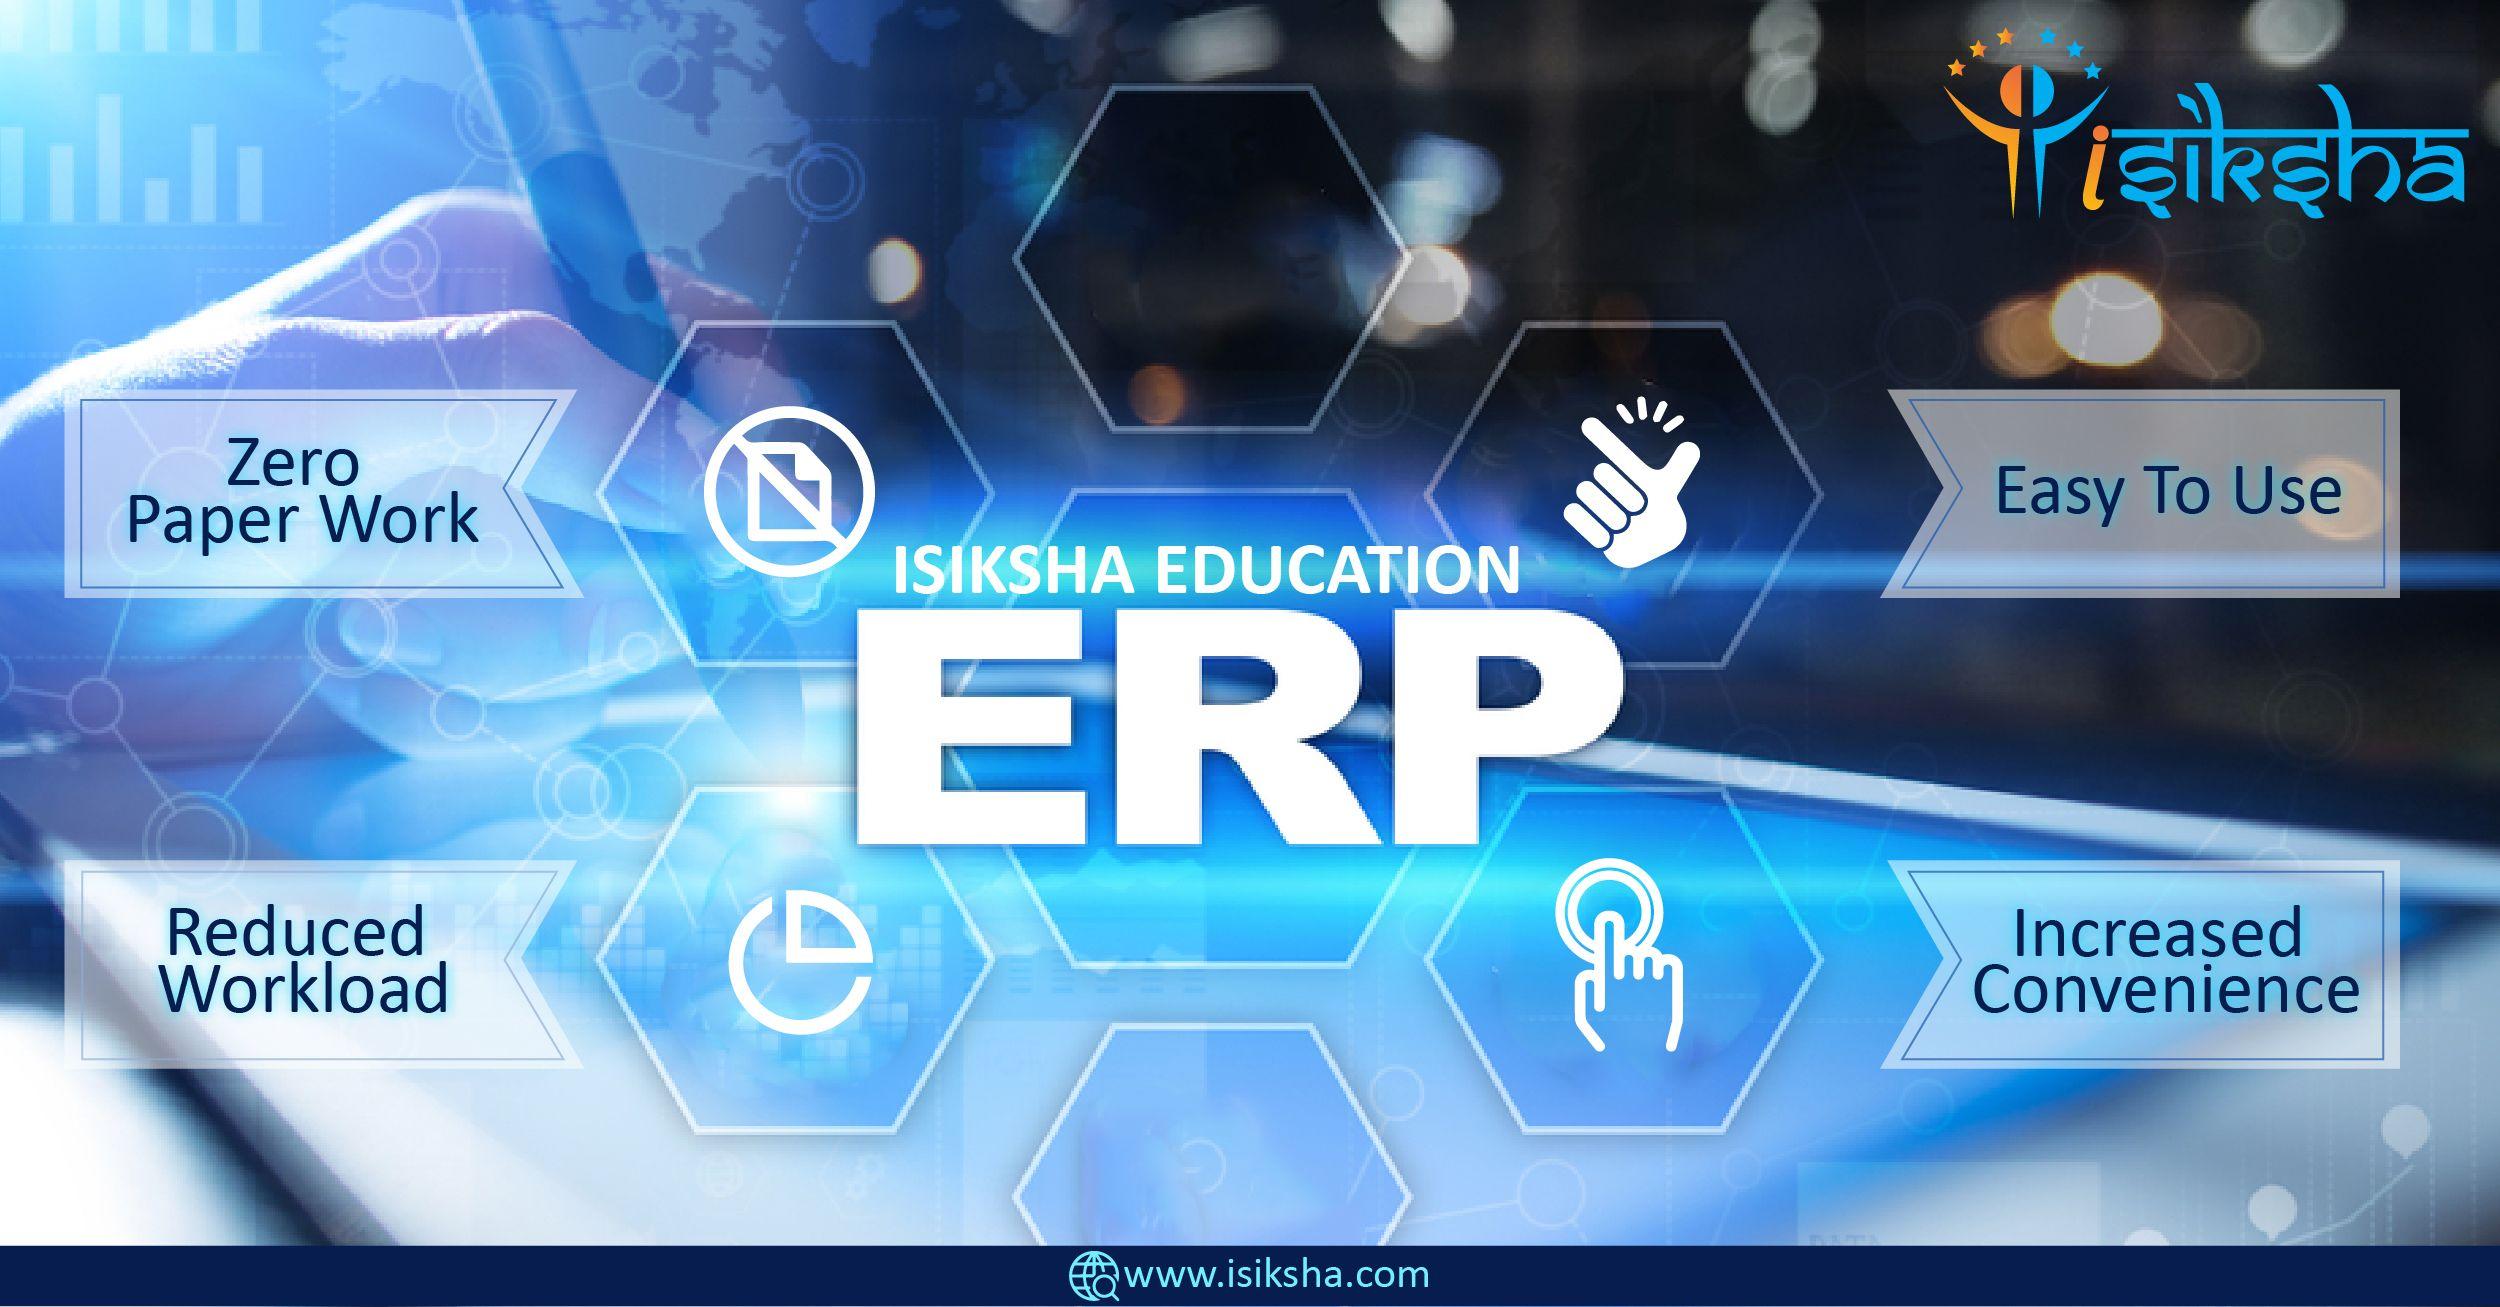 Isiksha Education ERP Software | Student attendance, Student information, School management